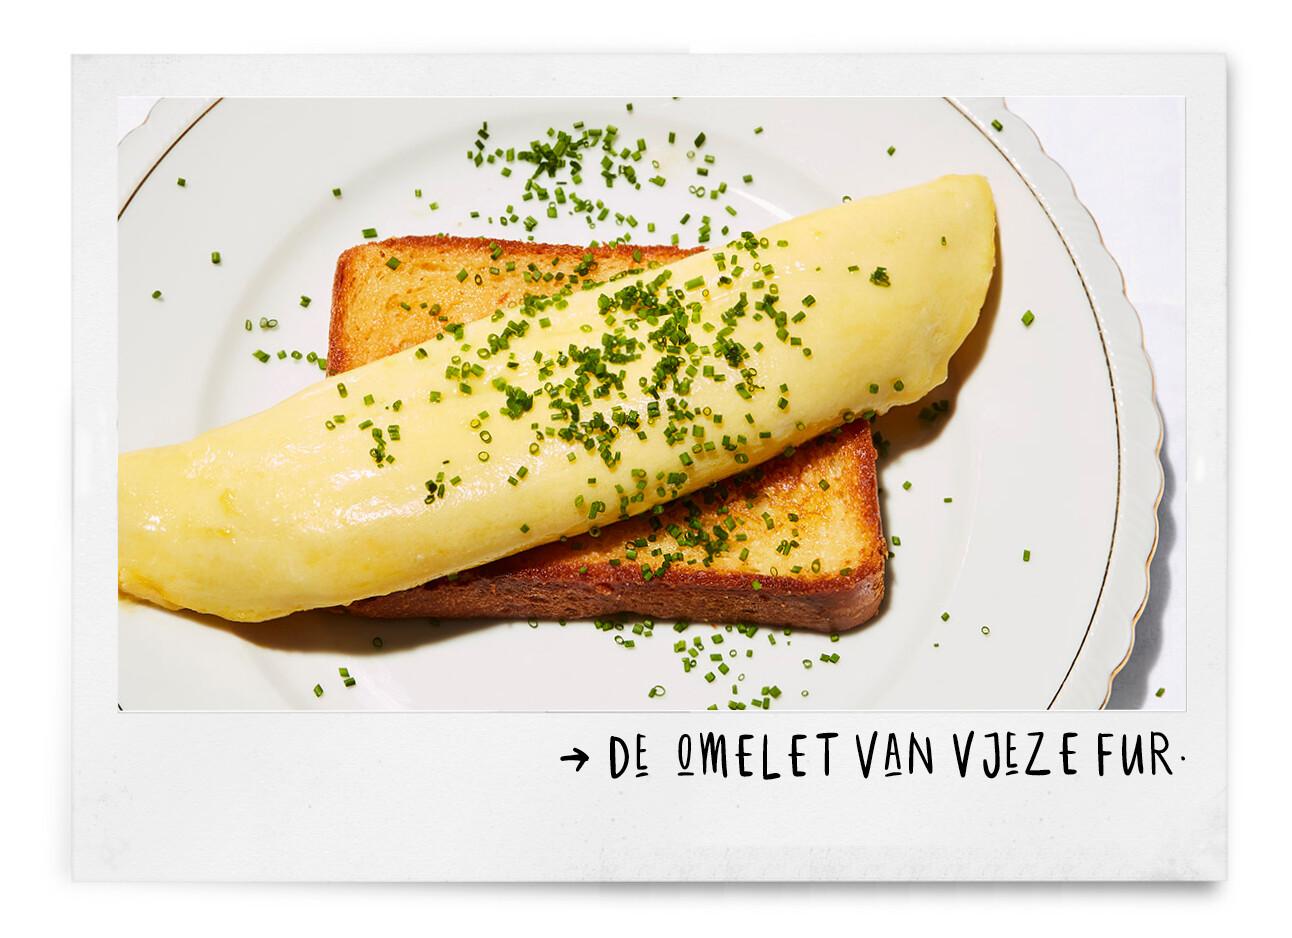 omelet vjeze fur